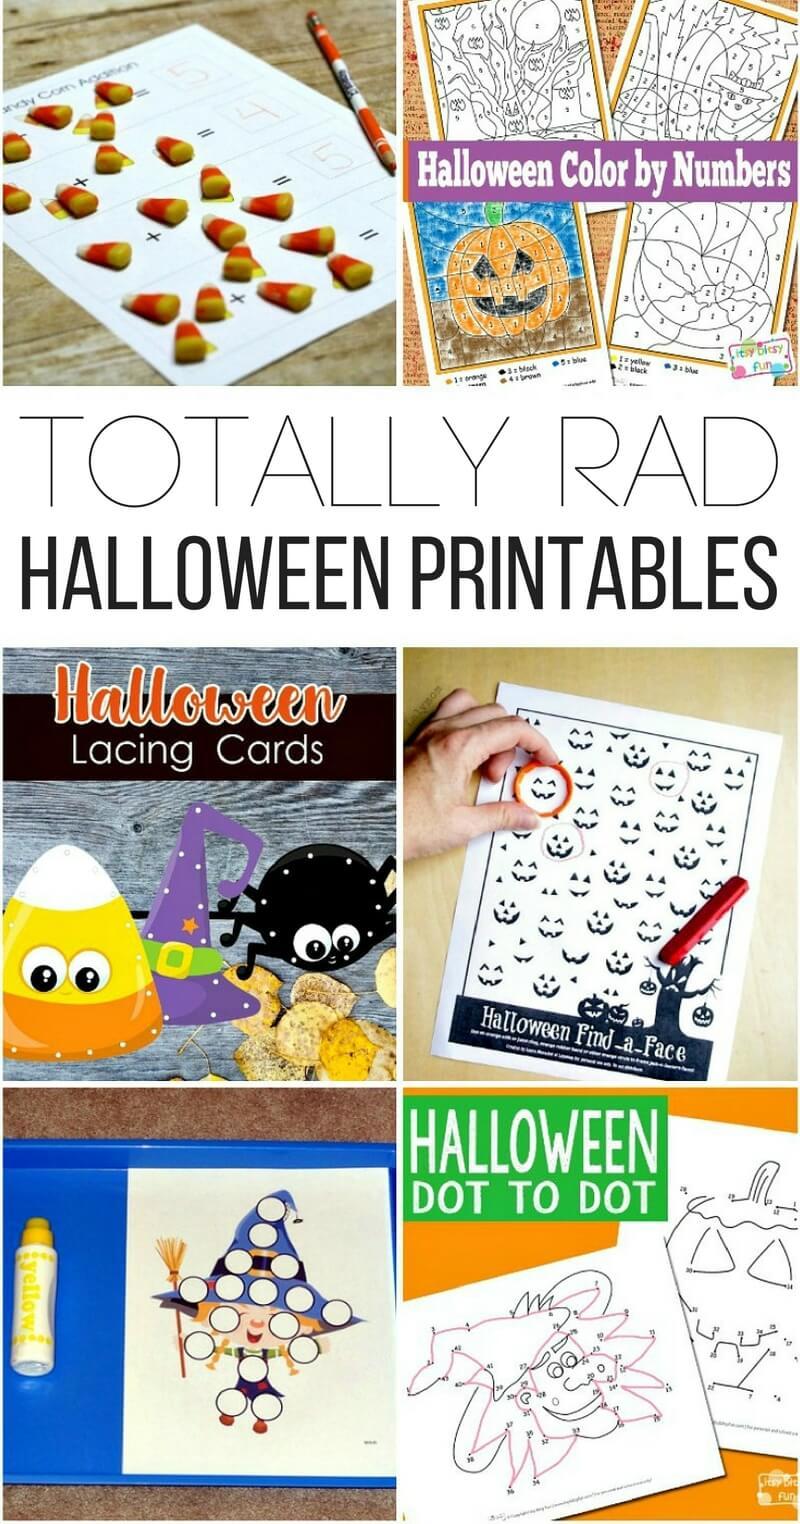 Totally Rad Halloween Printables!